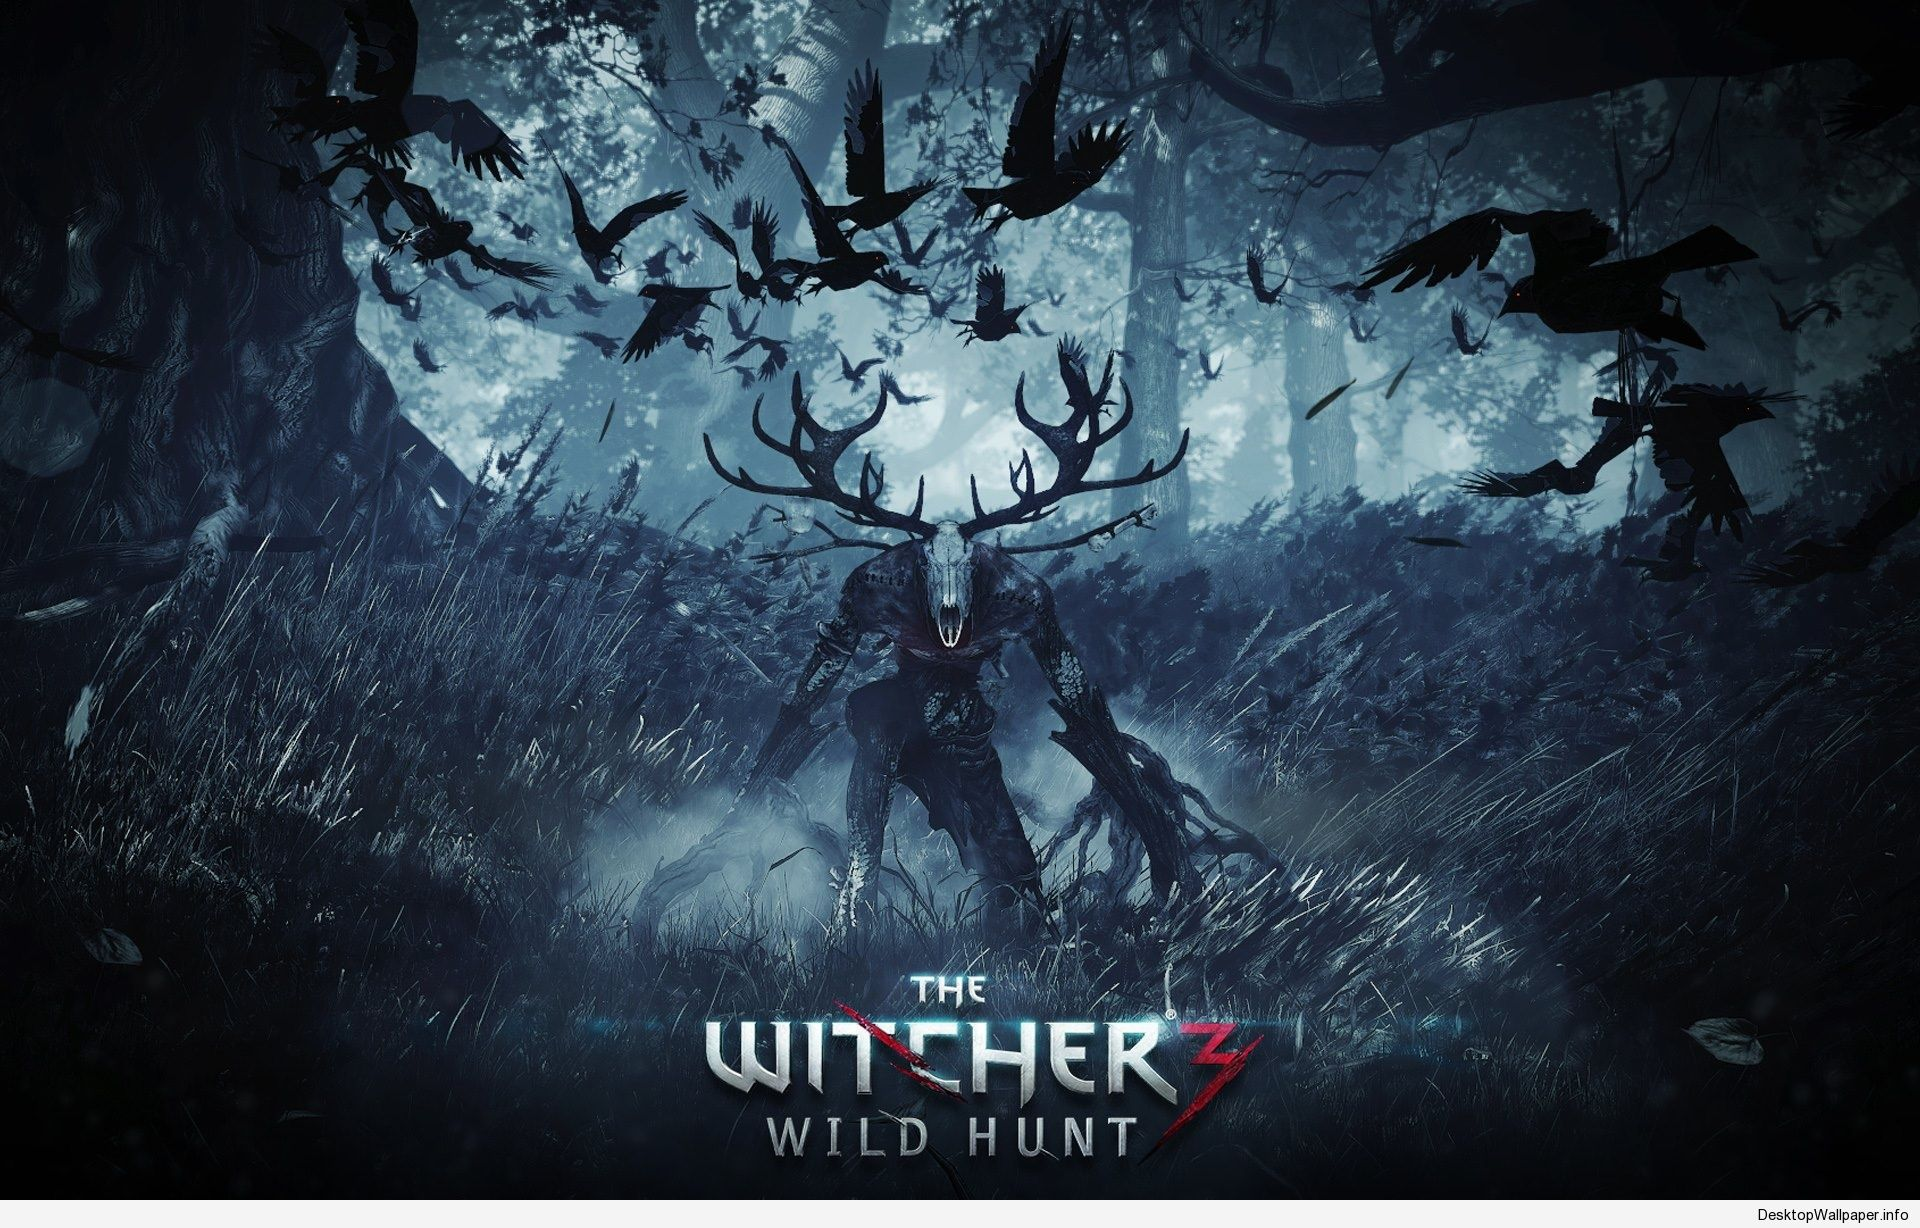 4k Witcher Wallpaper Http Desktopwallpaper Info 4k Witcher Wallpaper 12597 Wallpaper Witcher Wallpaper Wit The Witcher Wild Hunt Wild Hunt The Witcher